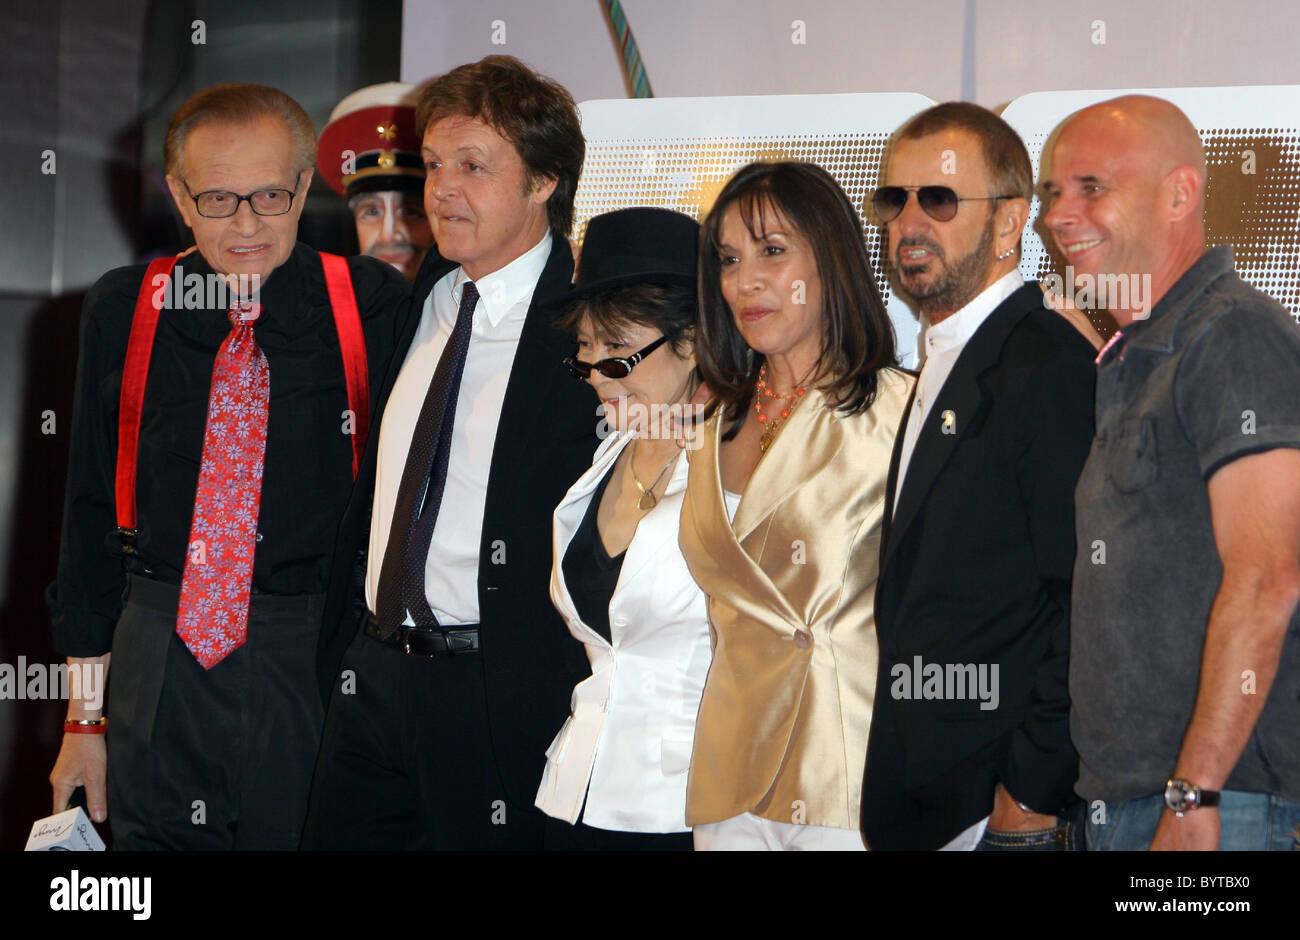 Larry King Paul Mccartney Yoko Ono Lennon Olivia Harrison Ringo Stock Photo Alamy